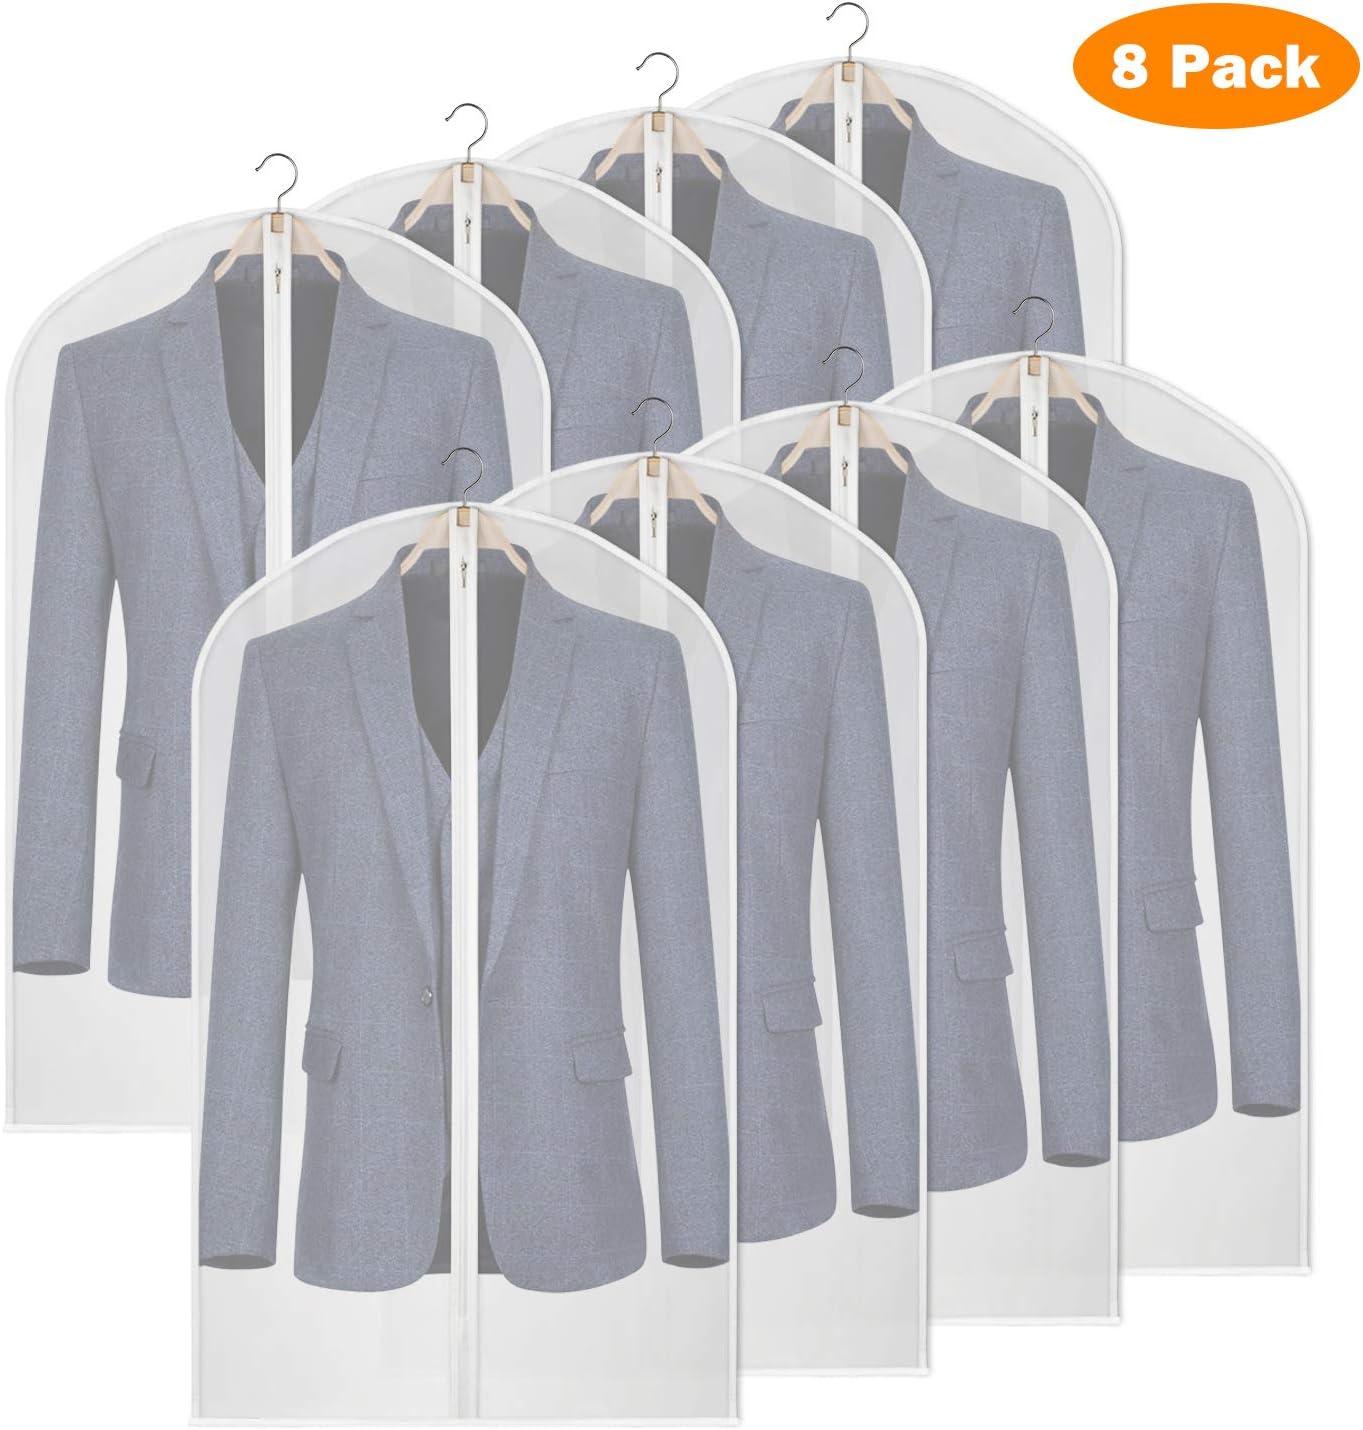 Clothes Dress Garment Cover Bag Dustproof Coat Skirt Storage Protector 3 Sizes